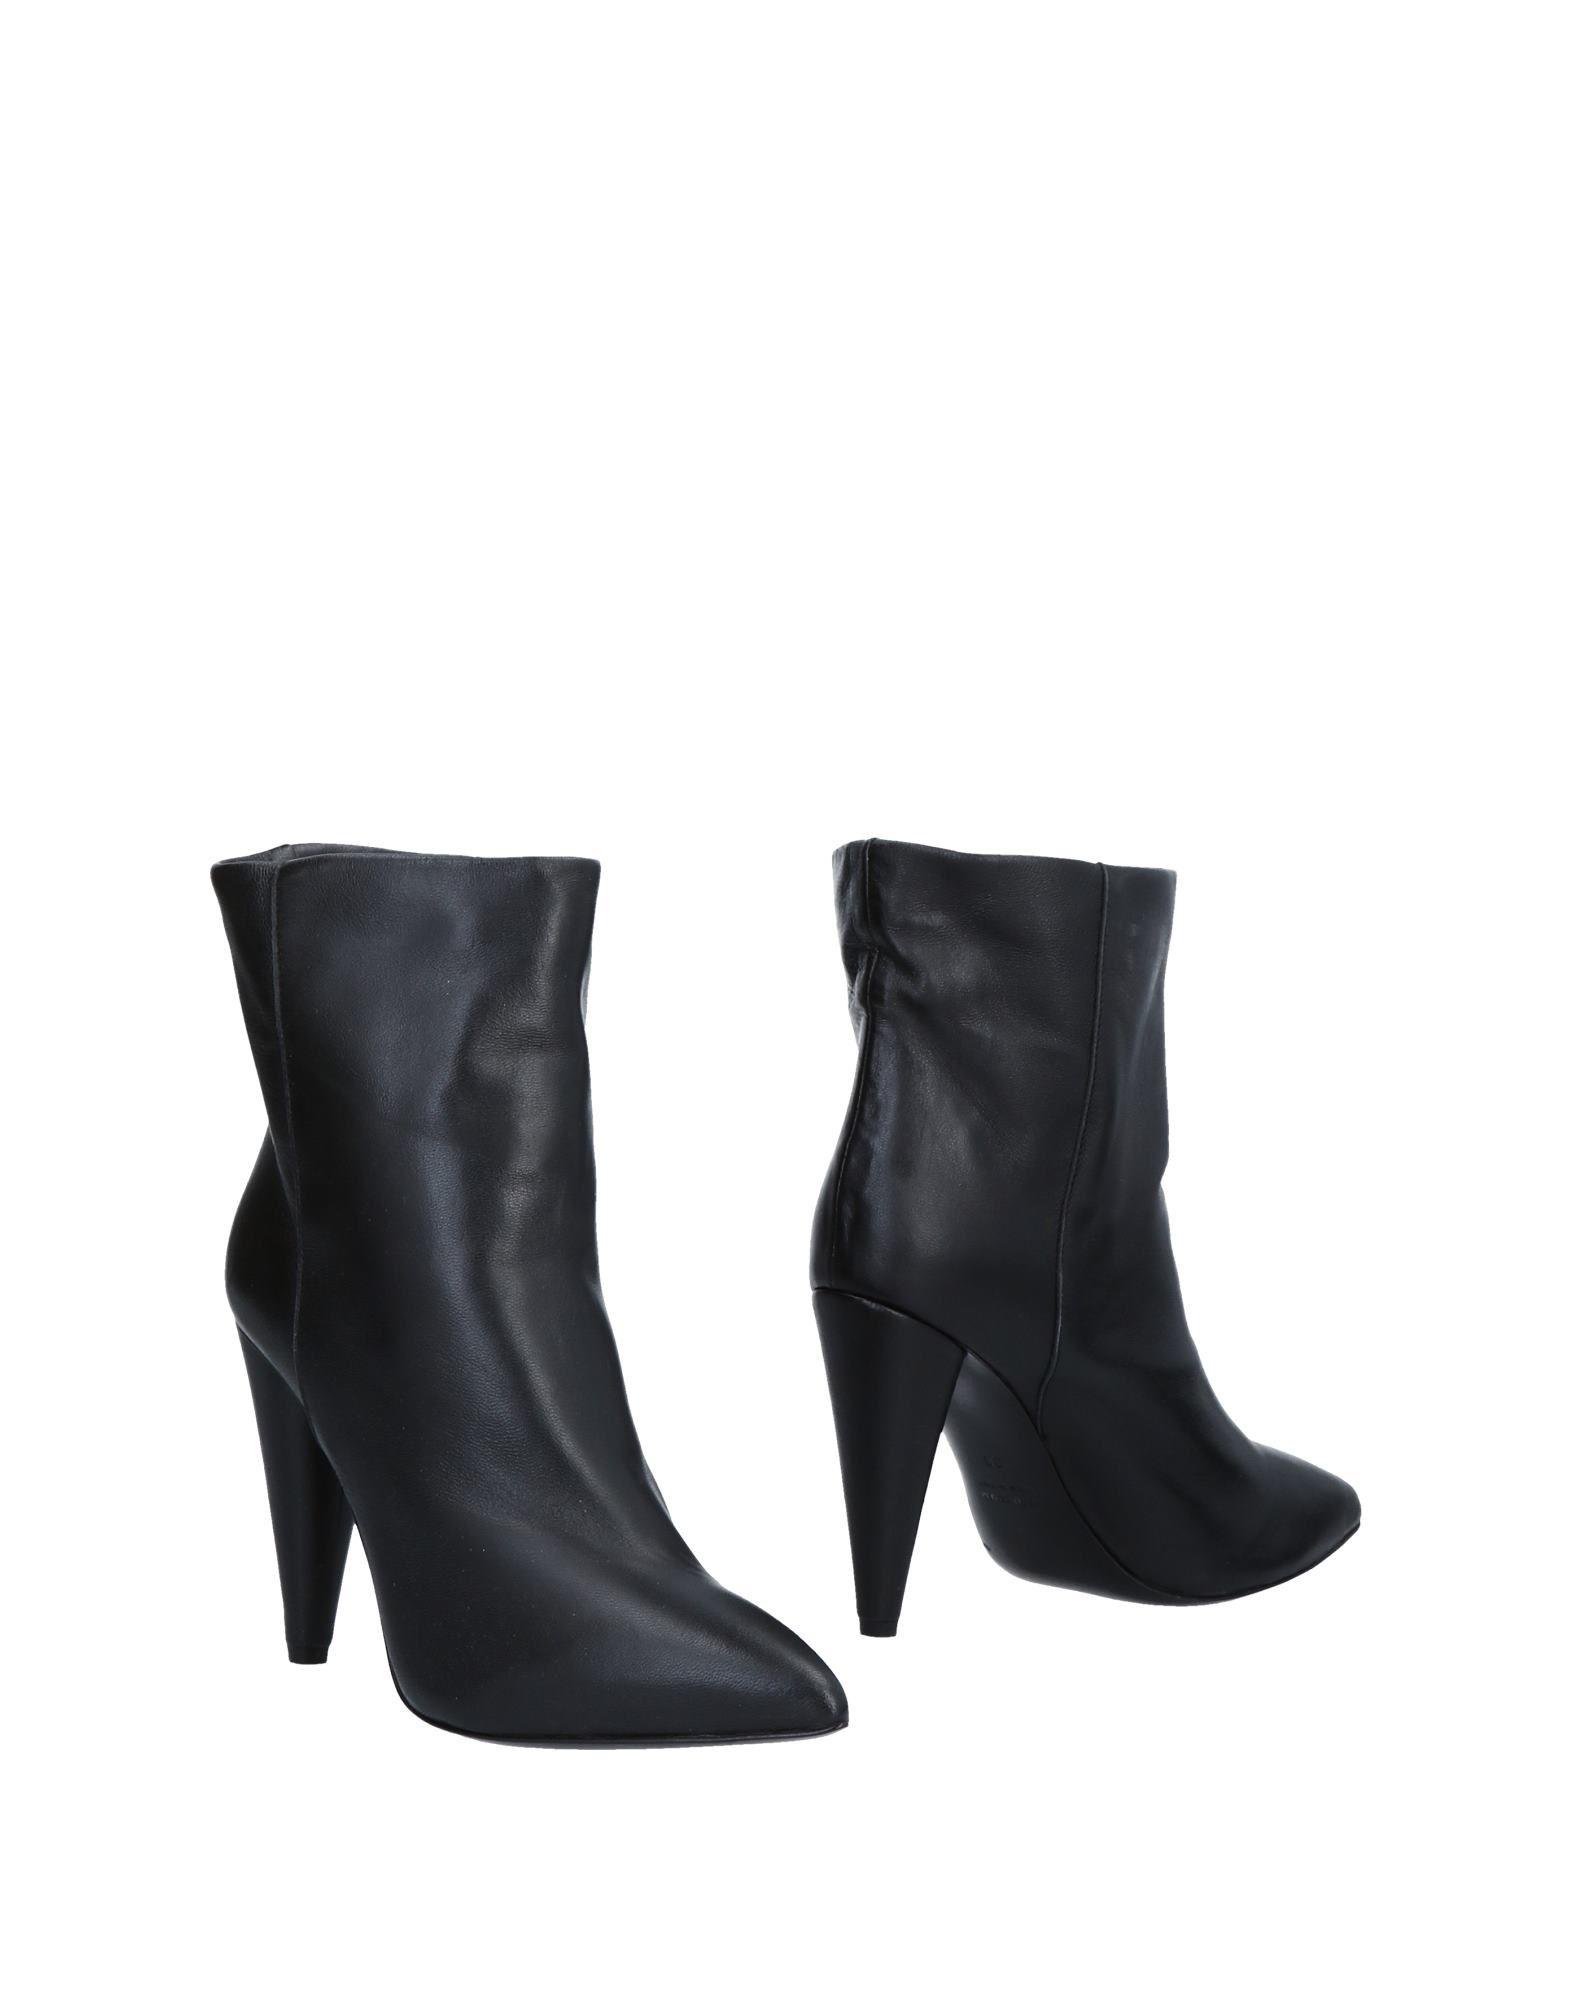 Erika Cavallini Ankle Boot Ankle - Women Erika Cavallini Ankle Boot Boots online on  Canada - 11485503MR cbc2ee